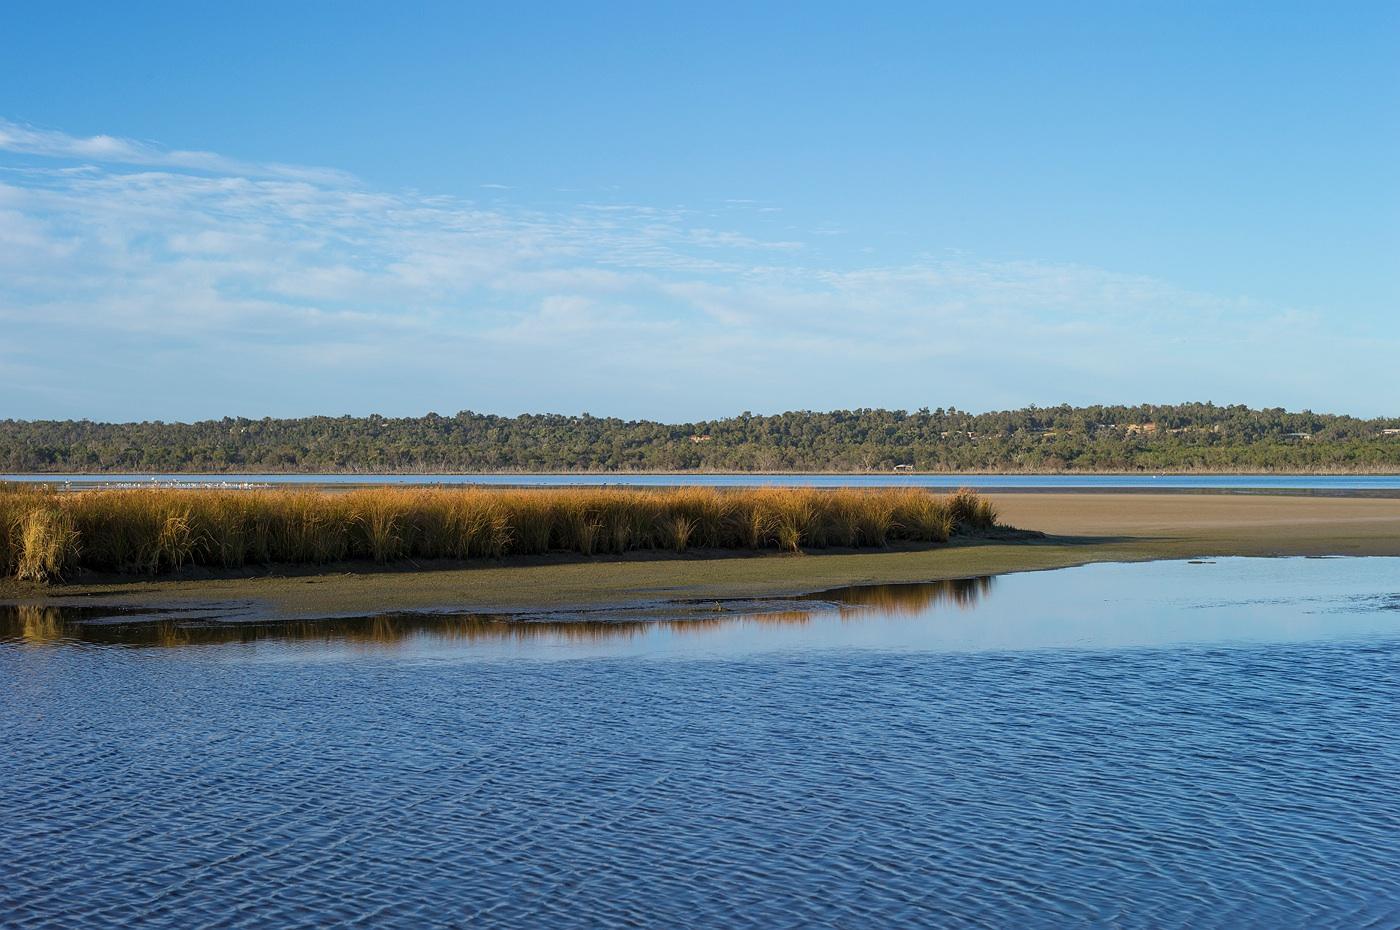 harvey_river_landscape_photography_18